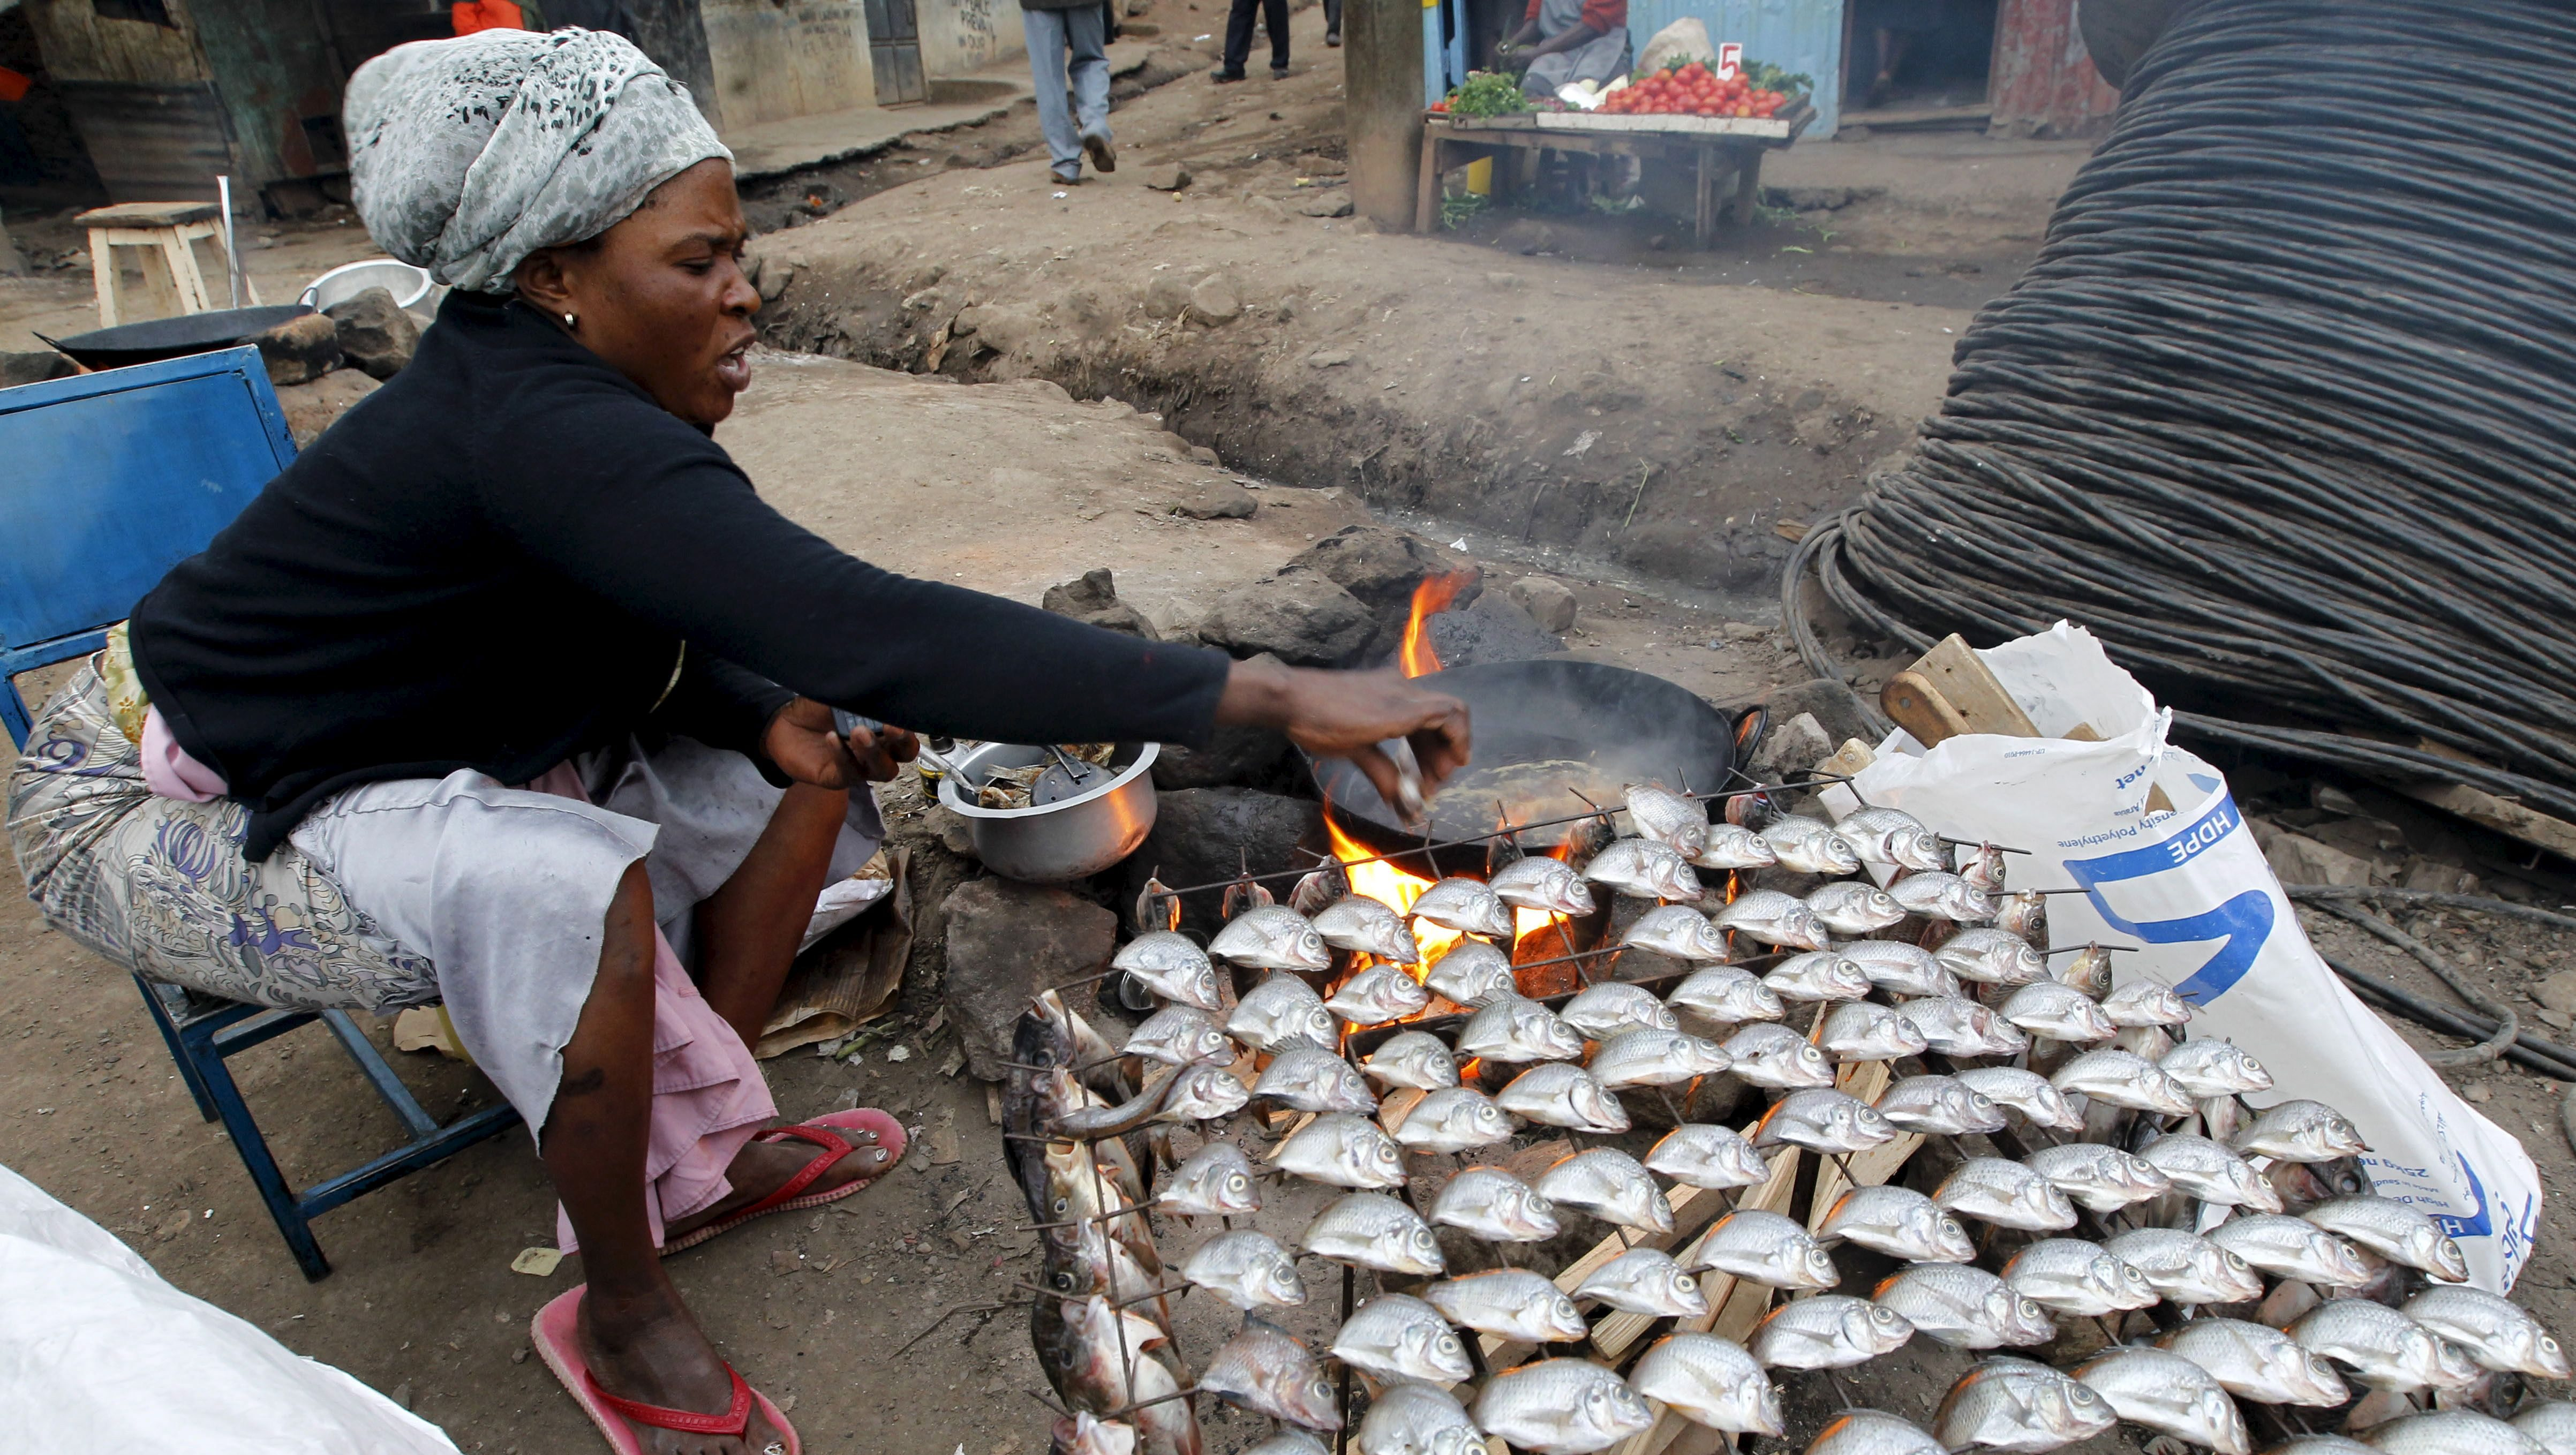 Obesity is taking hold in Kenya's poor urban slums